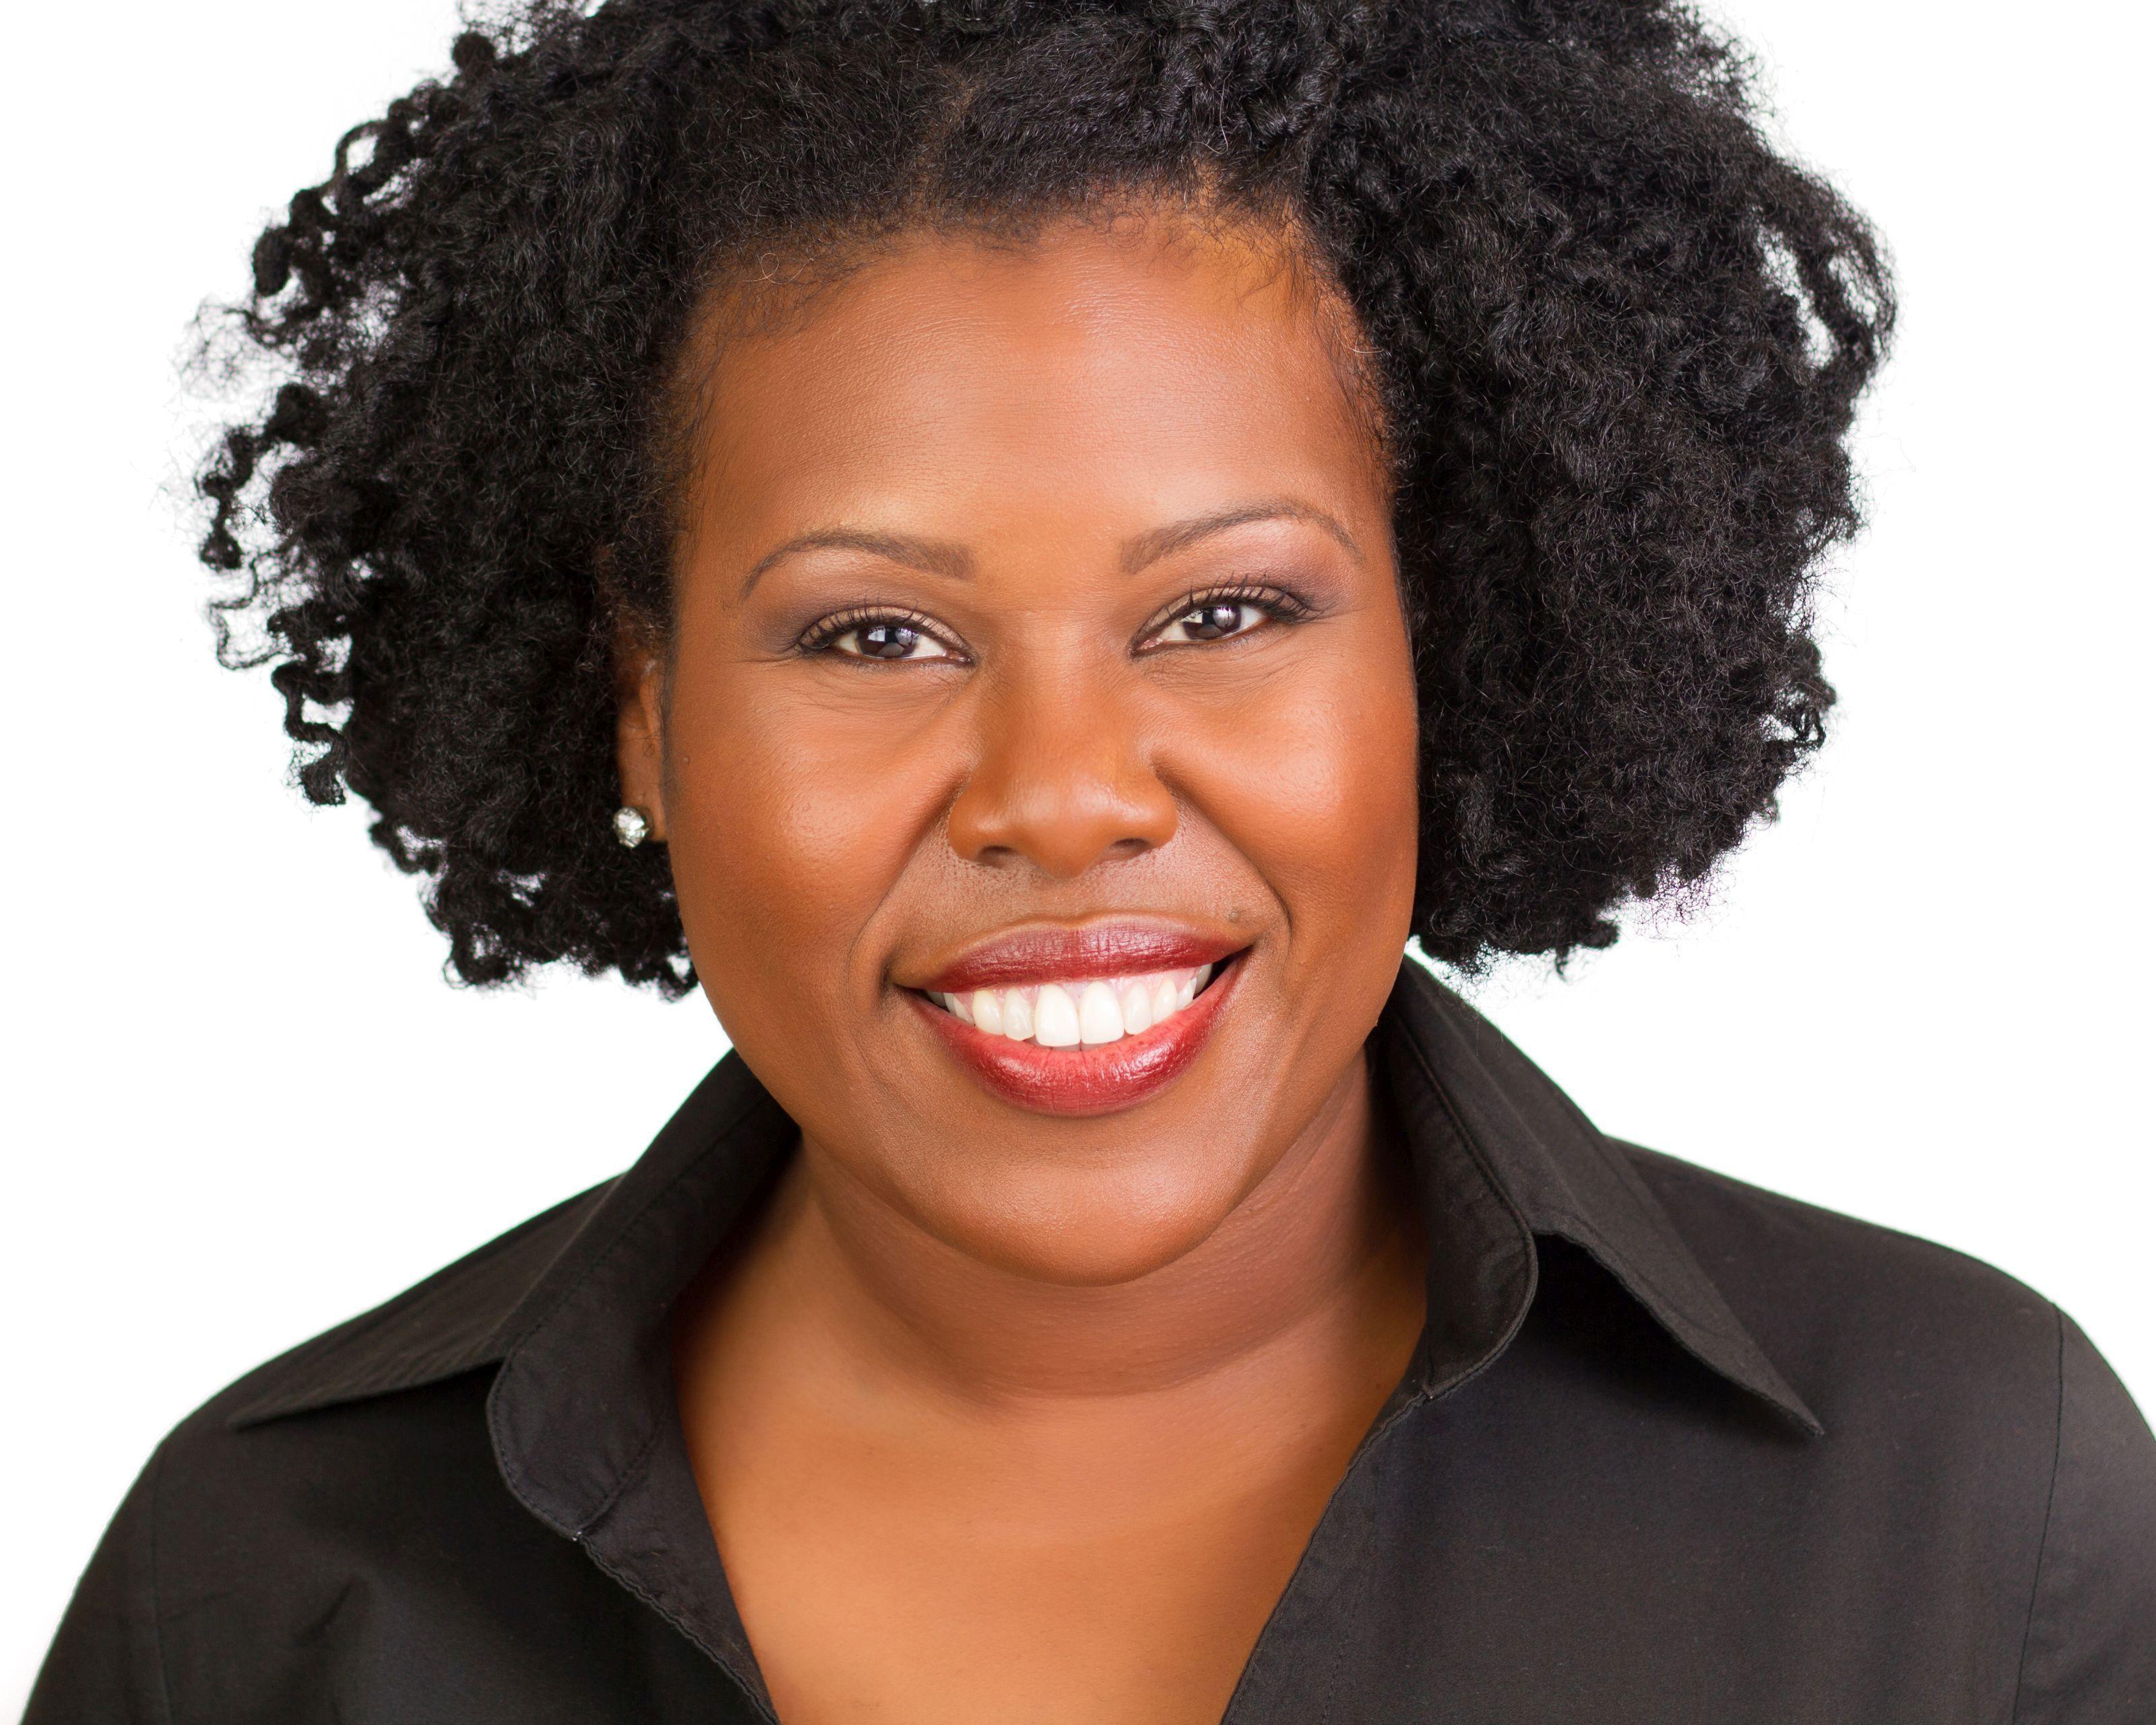 Teacher Tuesday – Meet Ms. Caldwell!